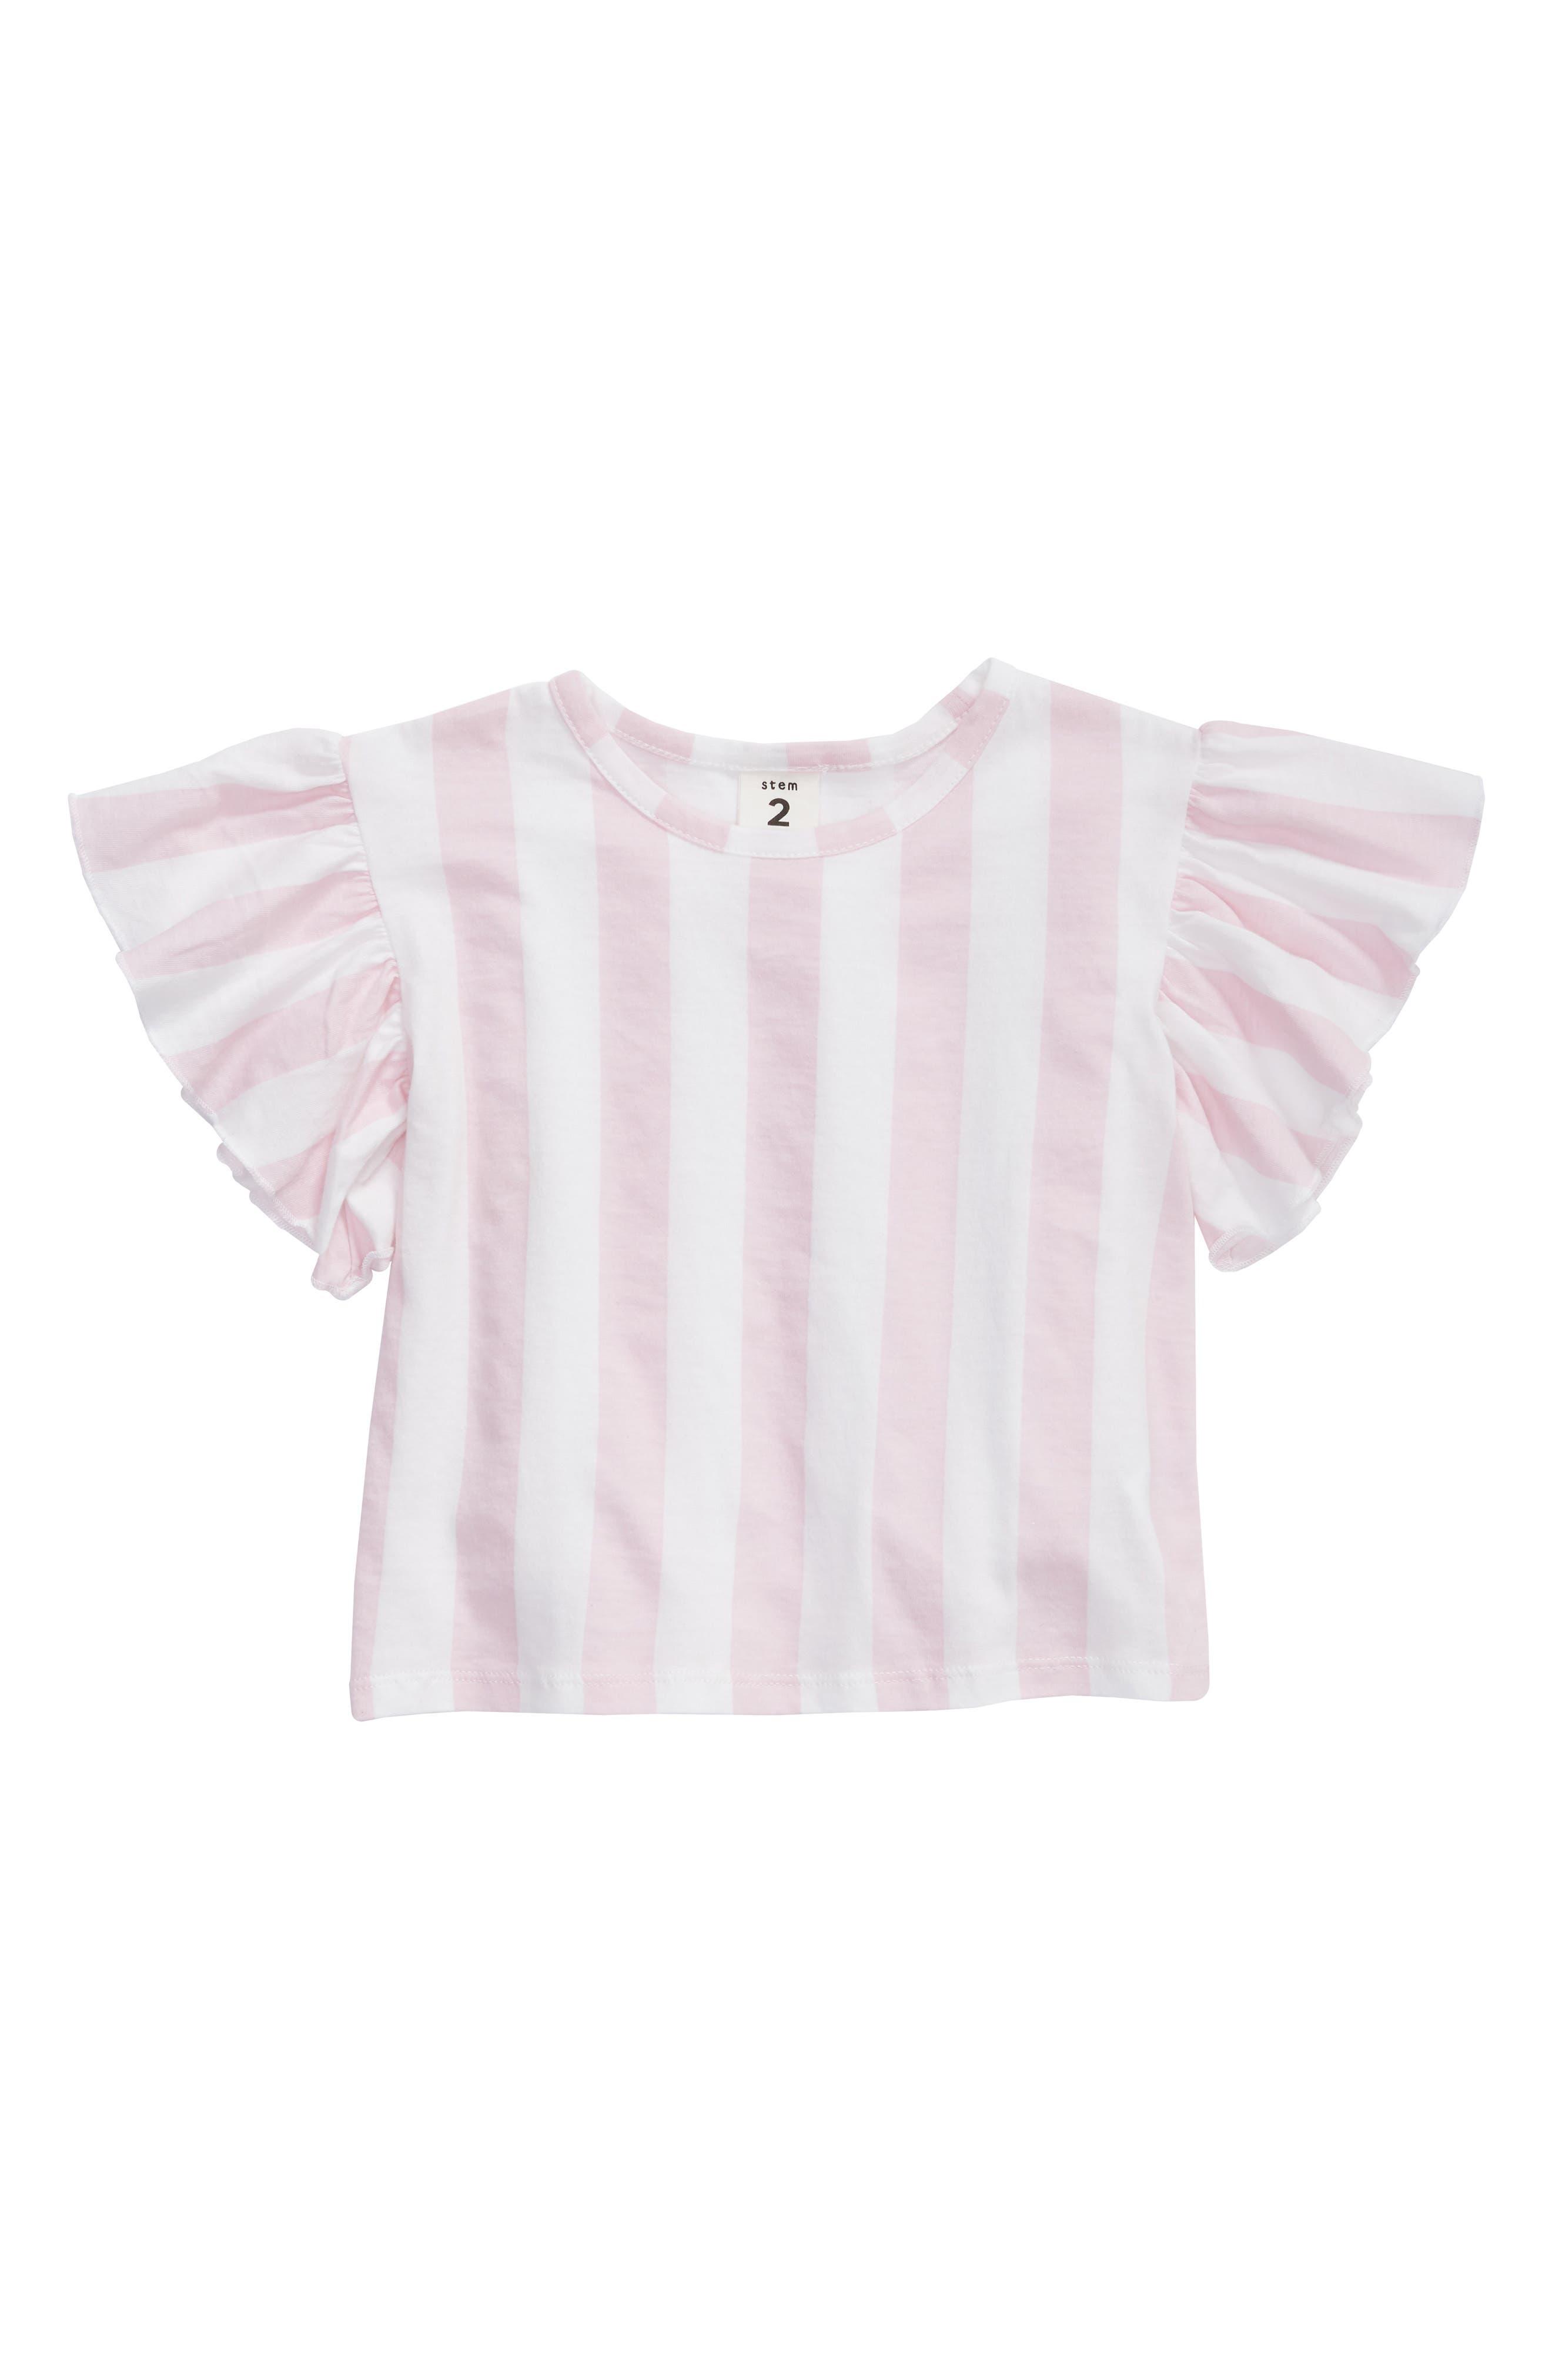 Toddler Girls Stem Soft Ruffle Tee Size 3T  Pink